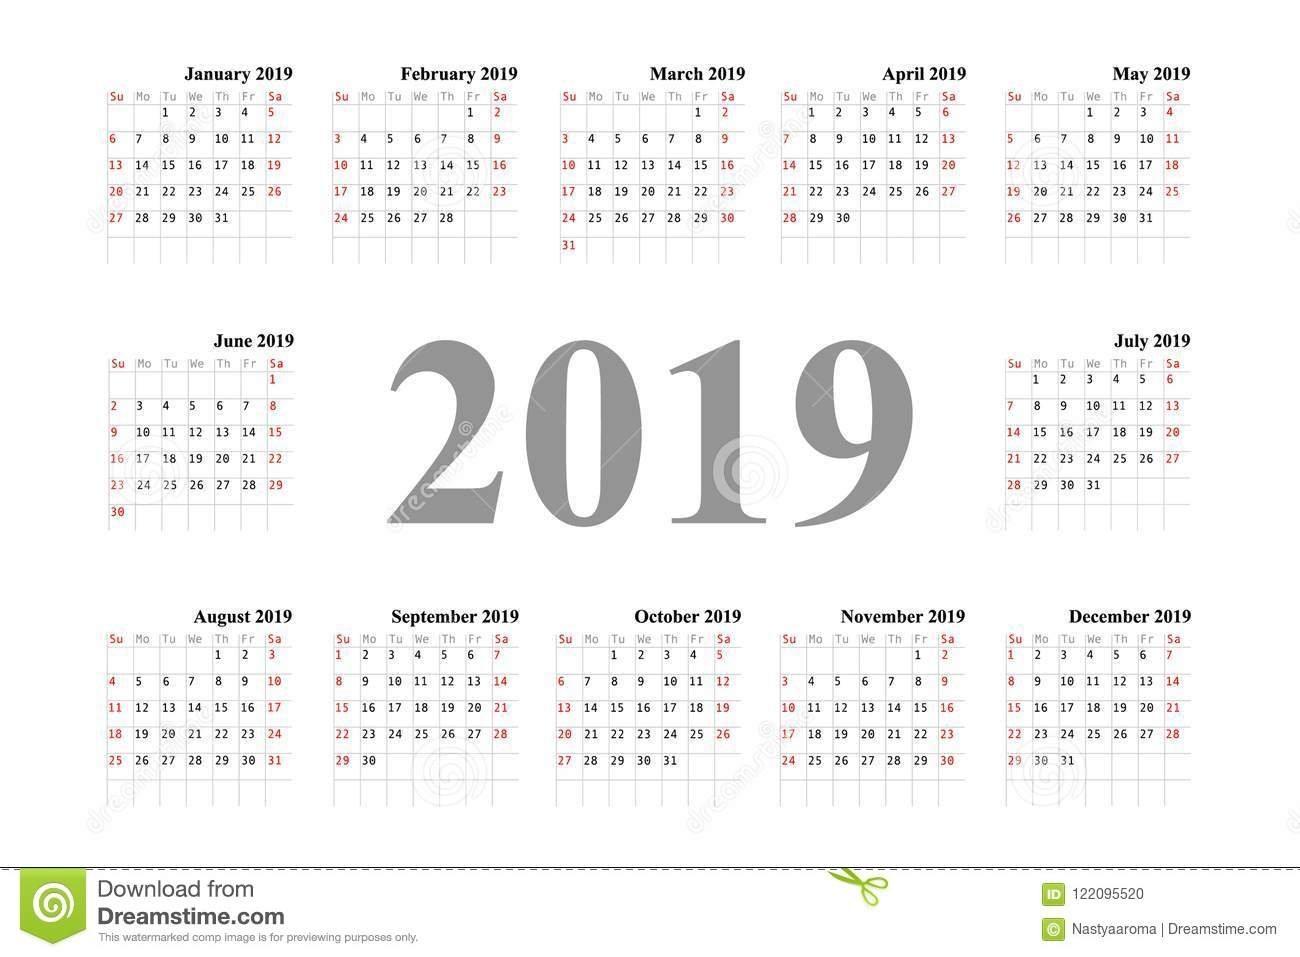 Calendar Template Design 2019 Stock Illustration - Illustration Of Calendar Week 36 2019